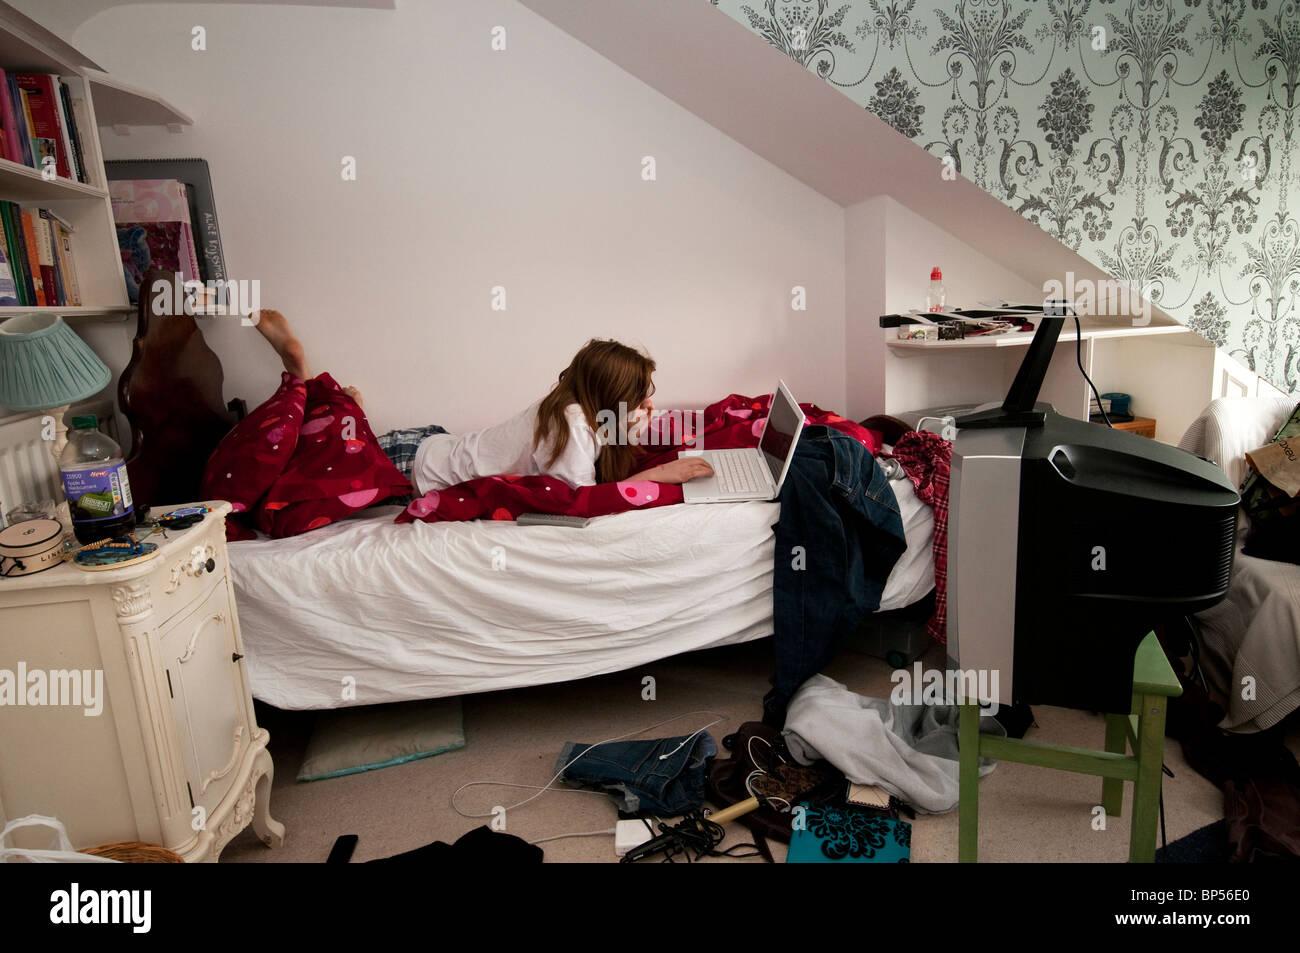 teenager room messy stockfotos teenager room messy bilder alamy. Black Bedroom Furniture Sets. Home Design Ideas